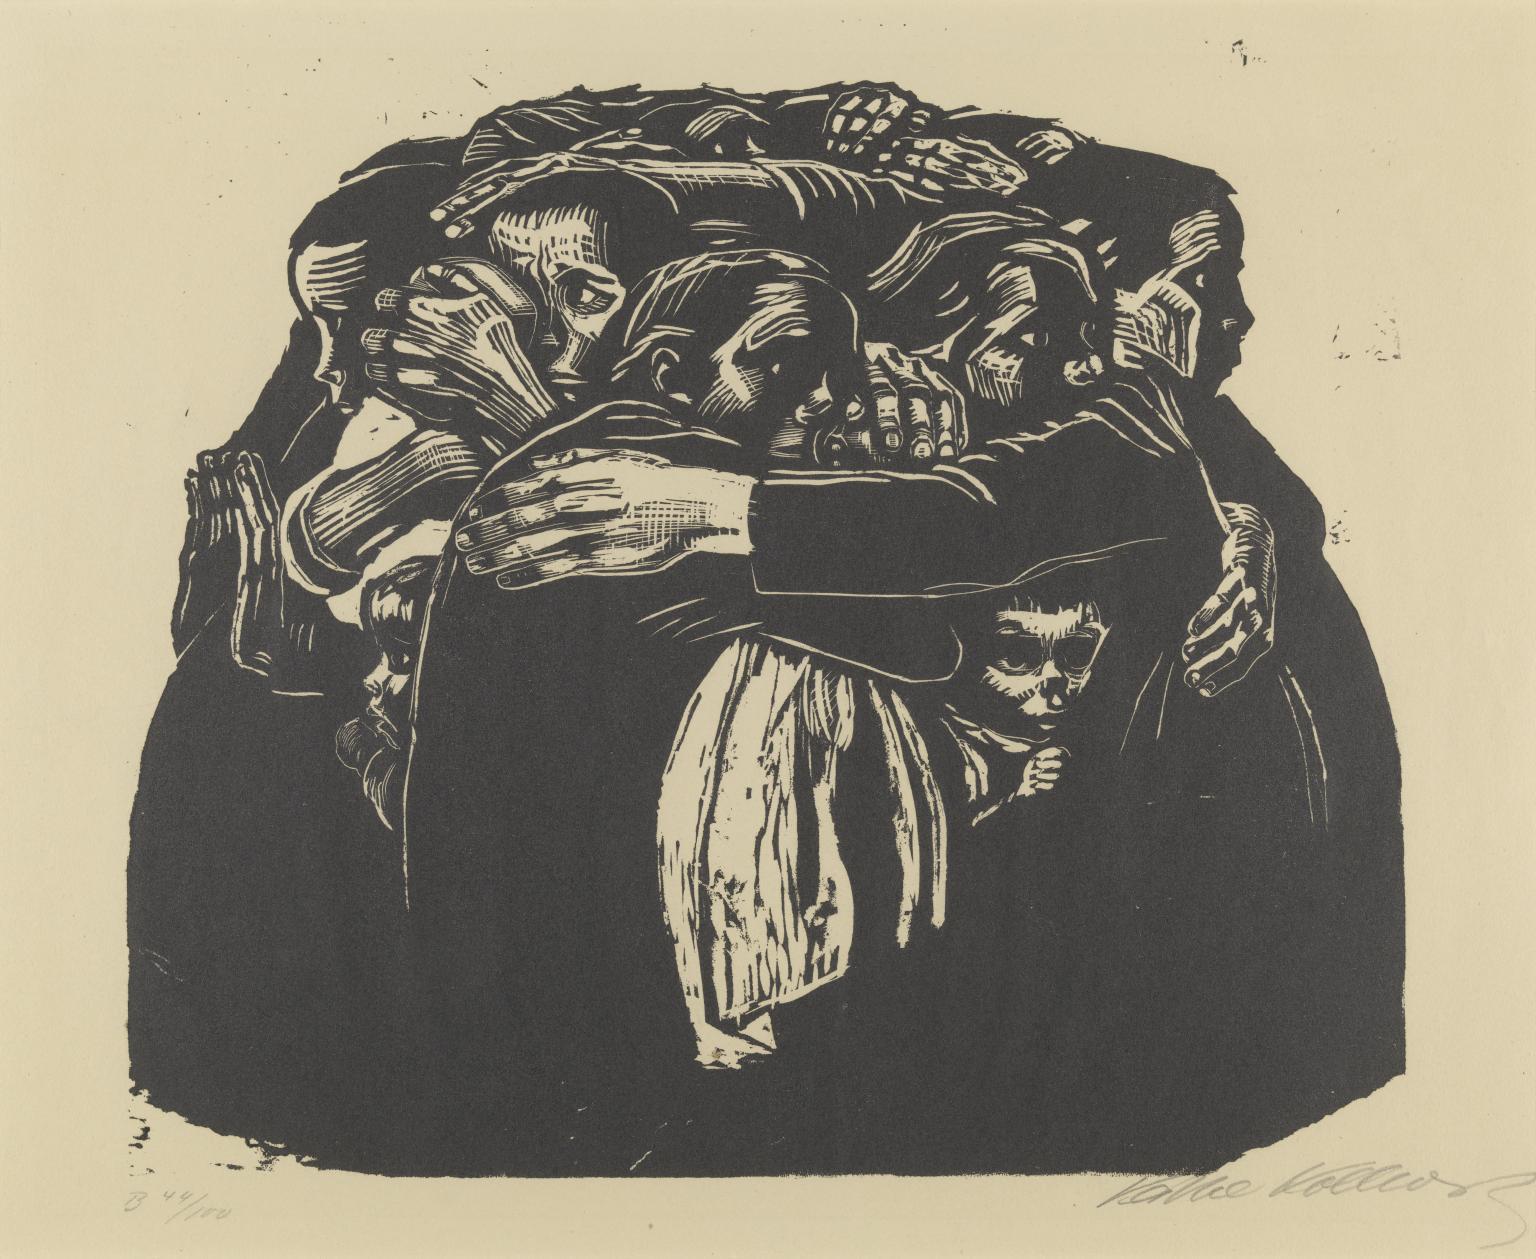 Käthe Kollwitz, The Mothers, 1921-22 (collection de la Tate Modern).